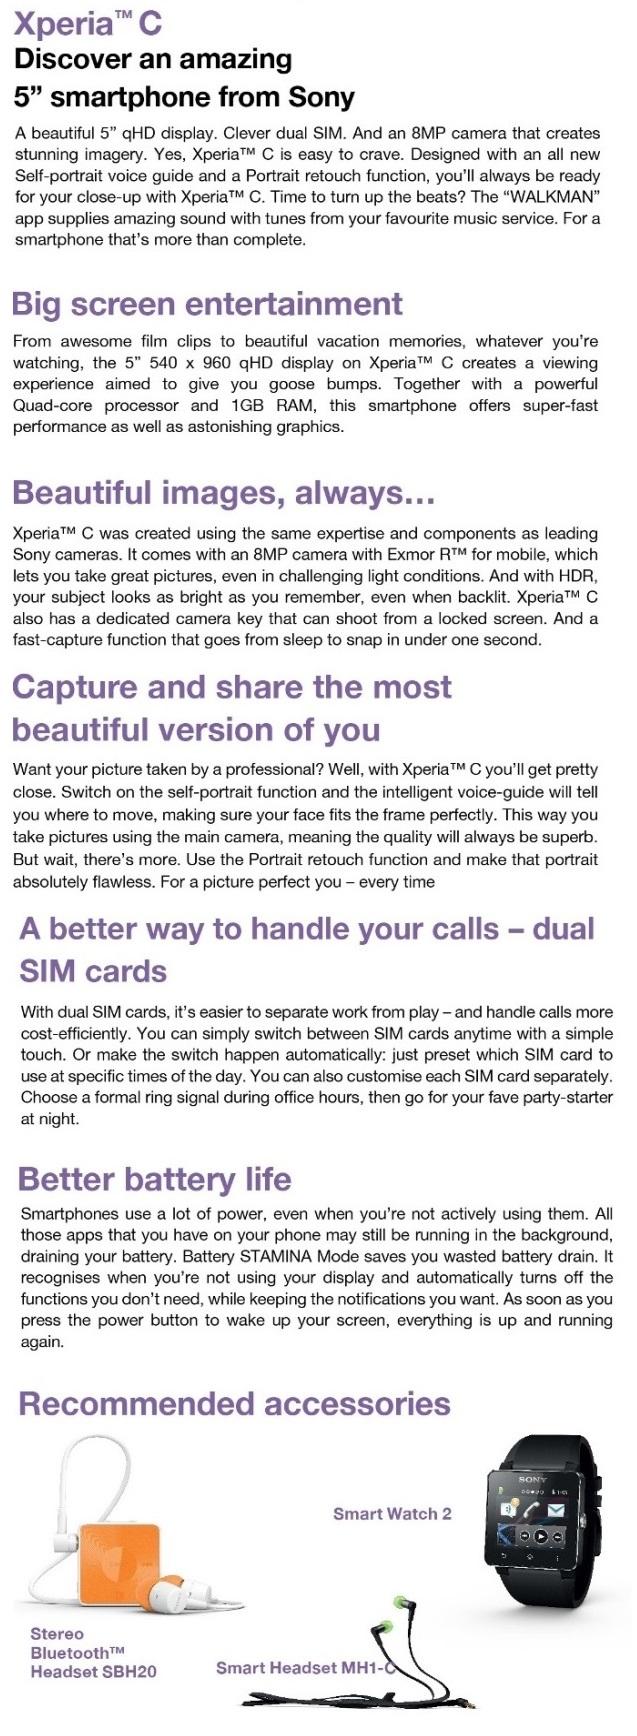 https://phoneworld.com.pk/wp-content/uploads/2014/06/Xperia-C-DL-Leaflet1-ZONG-02.jpg